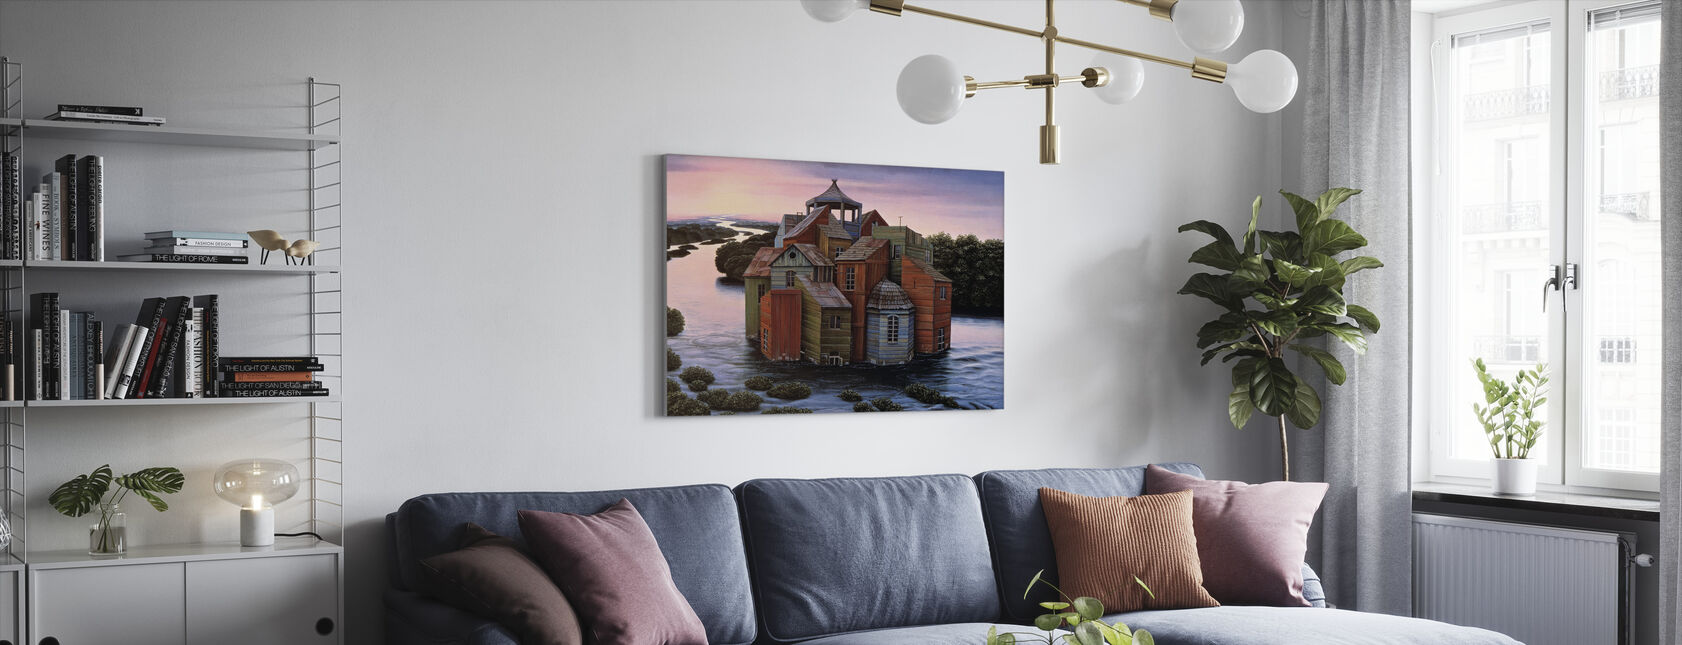 Fallingwater eiendom - Lerretsbilde - Stue